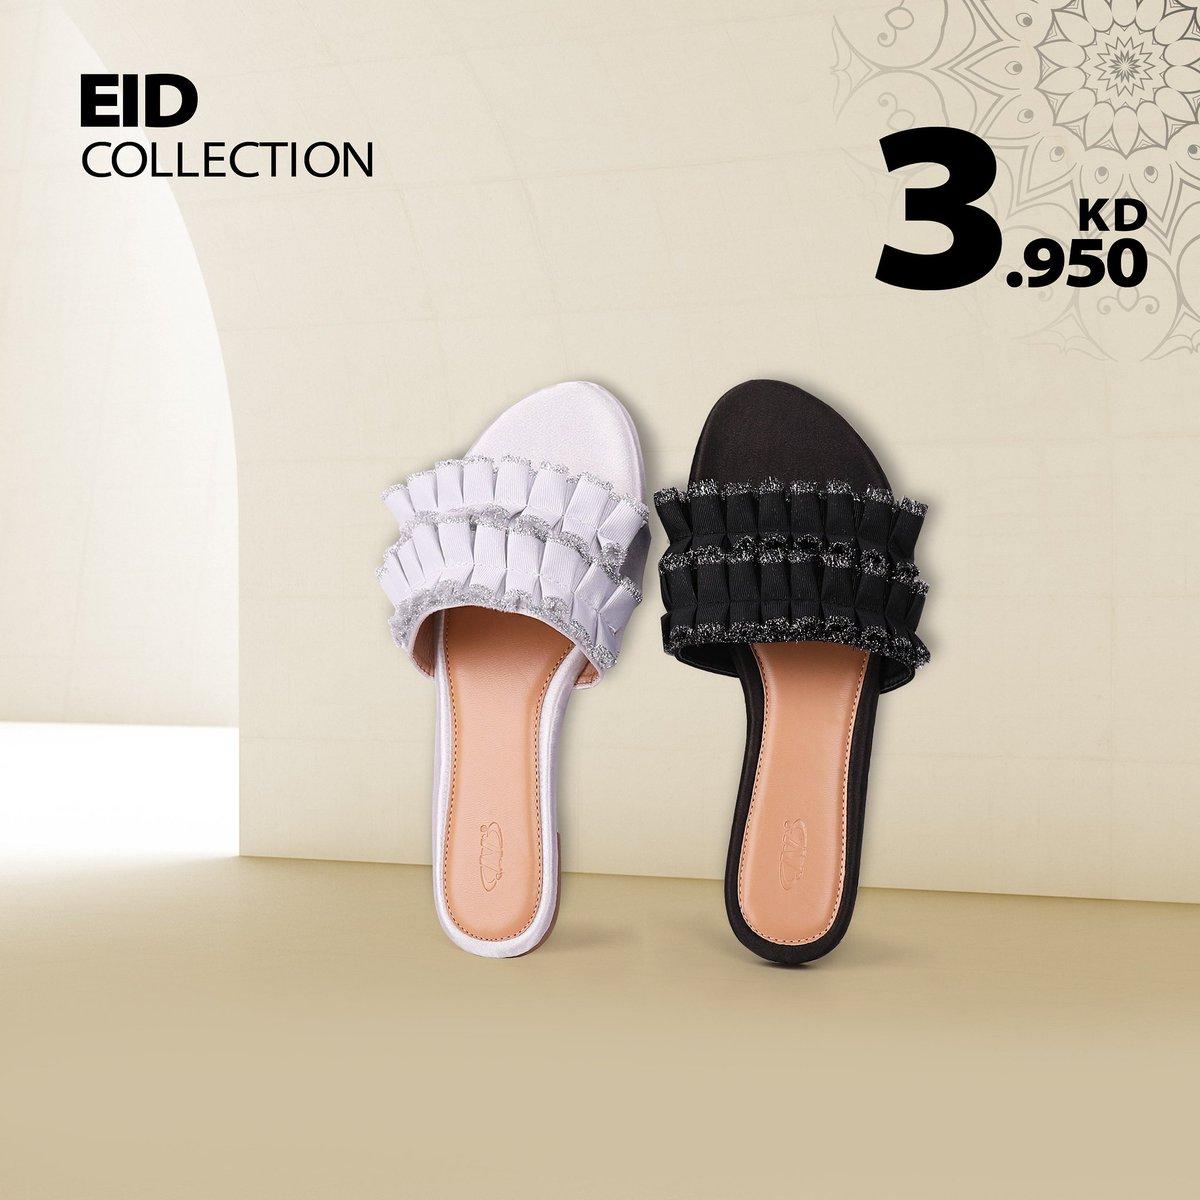 502e72c52 الآن لدى النصر New Eid Collection for Ladies Shoes. Now at Al Nasser  #kuwait #ramadan #summer #collection #ladies #shoes #Alnasser #الكويت  #تشكيلة #العيد ...